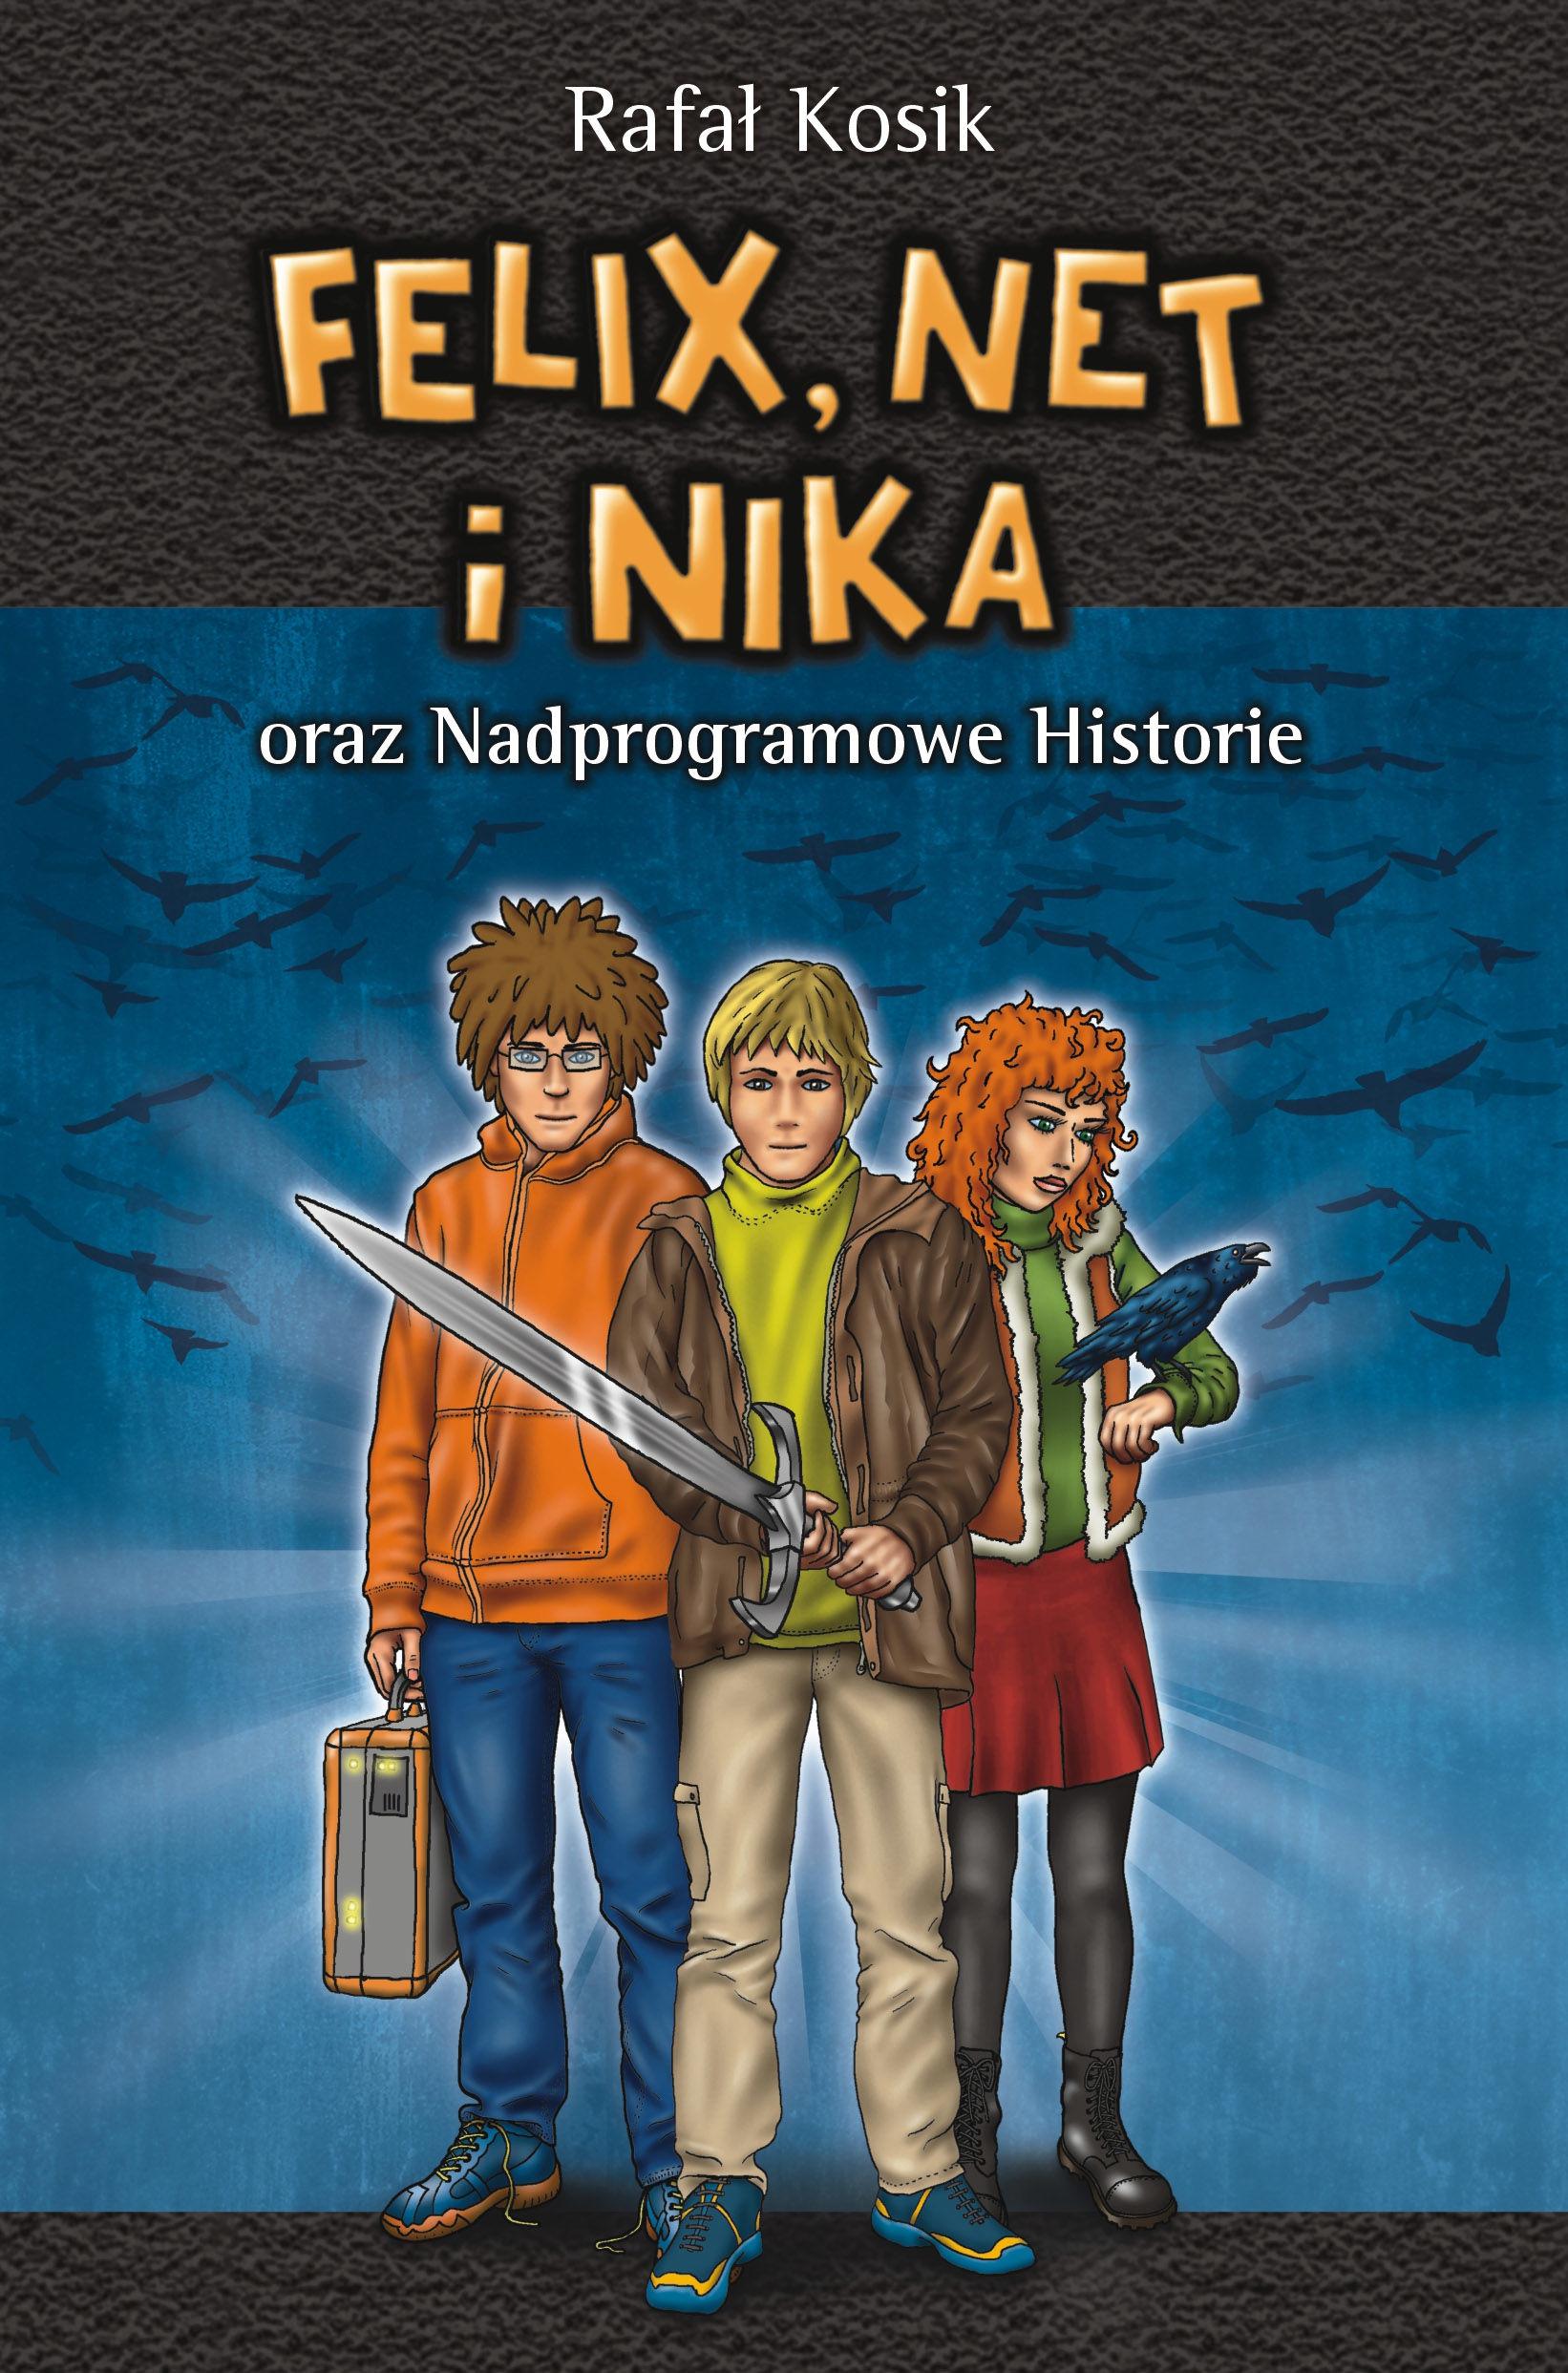 Felix, Net i Nika oraz Nadprogramowe Historie - Rafał Kosik - ebook